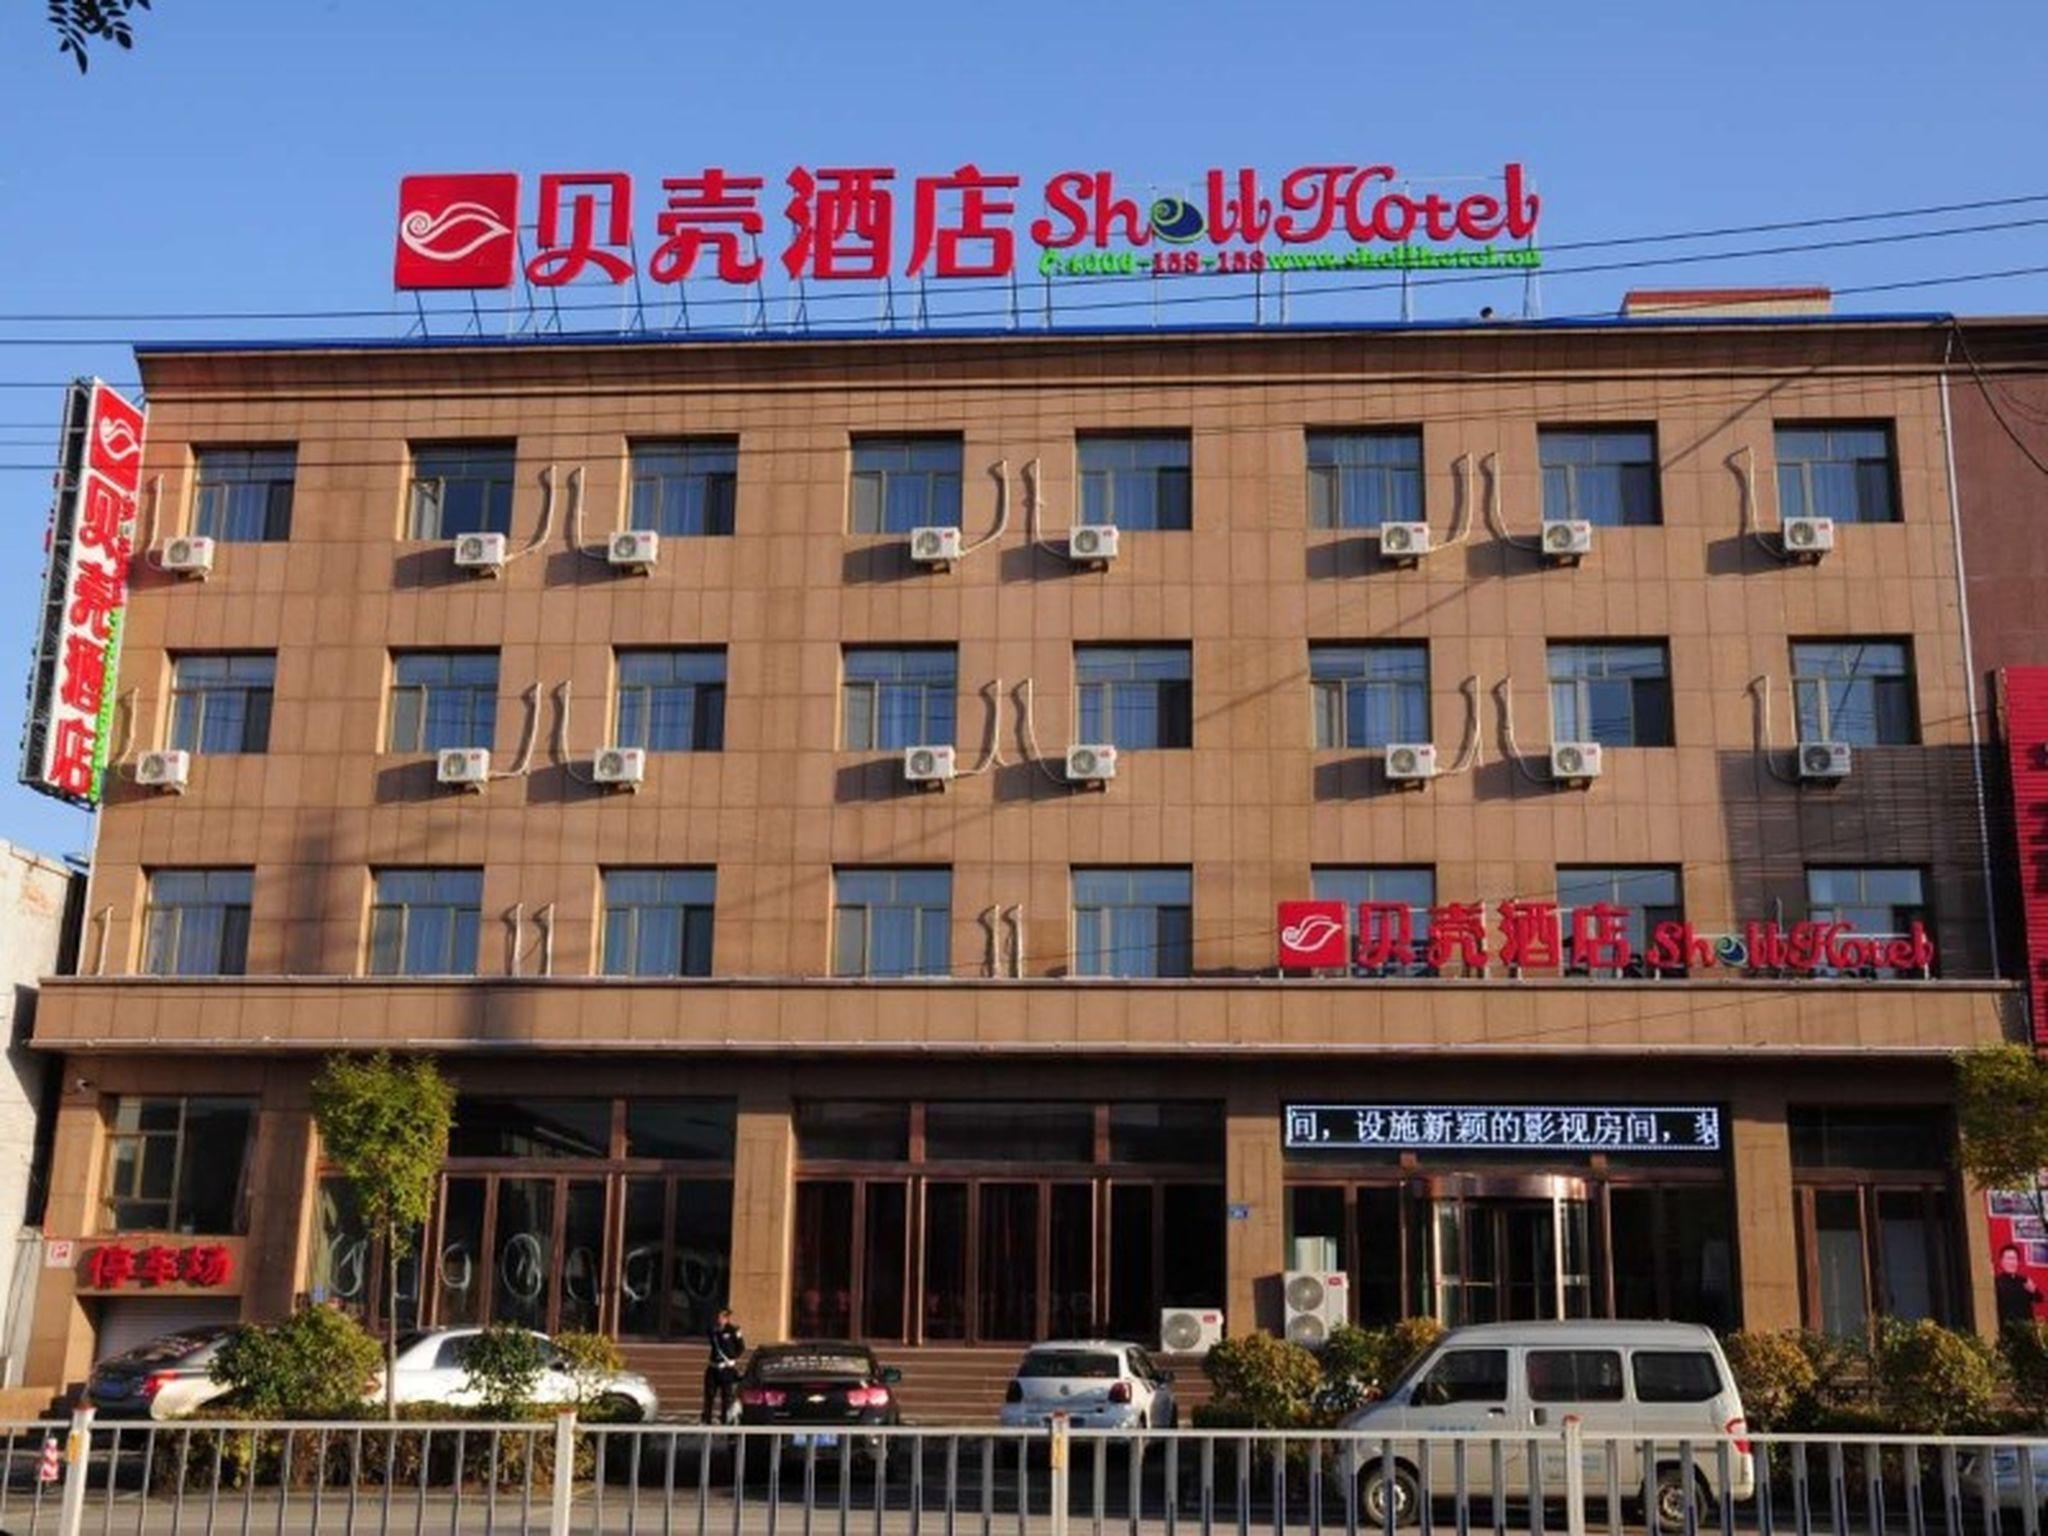 GreenTree Inn Xinzhou Dai District 108 State Road Shell Hotel